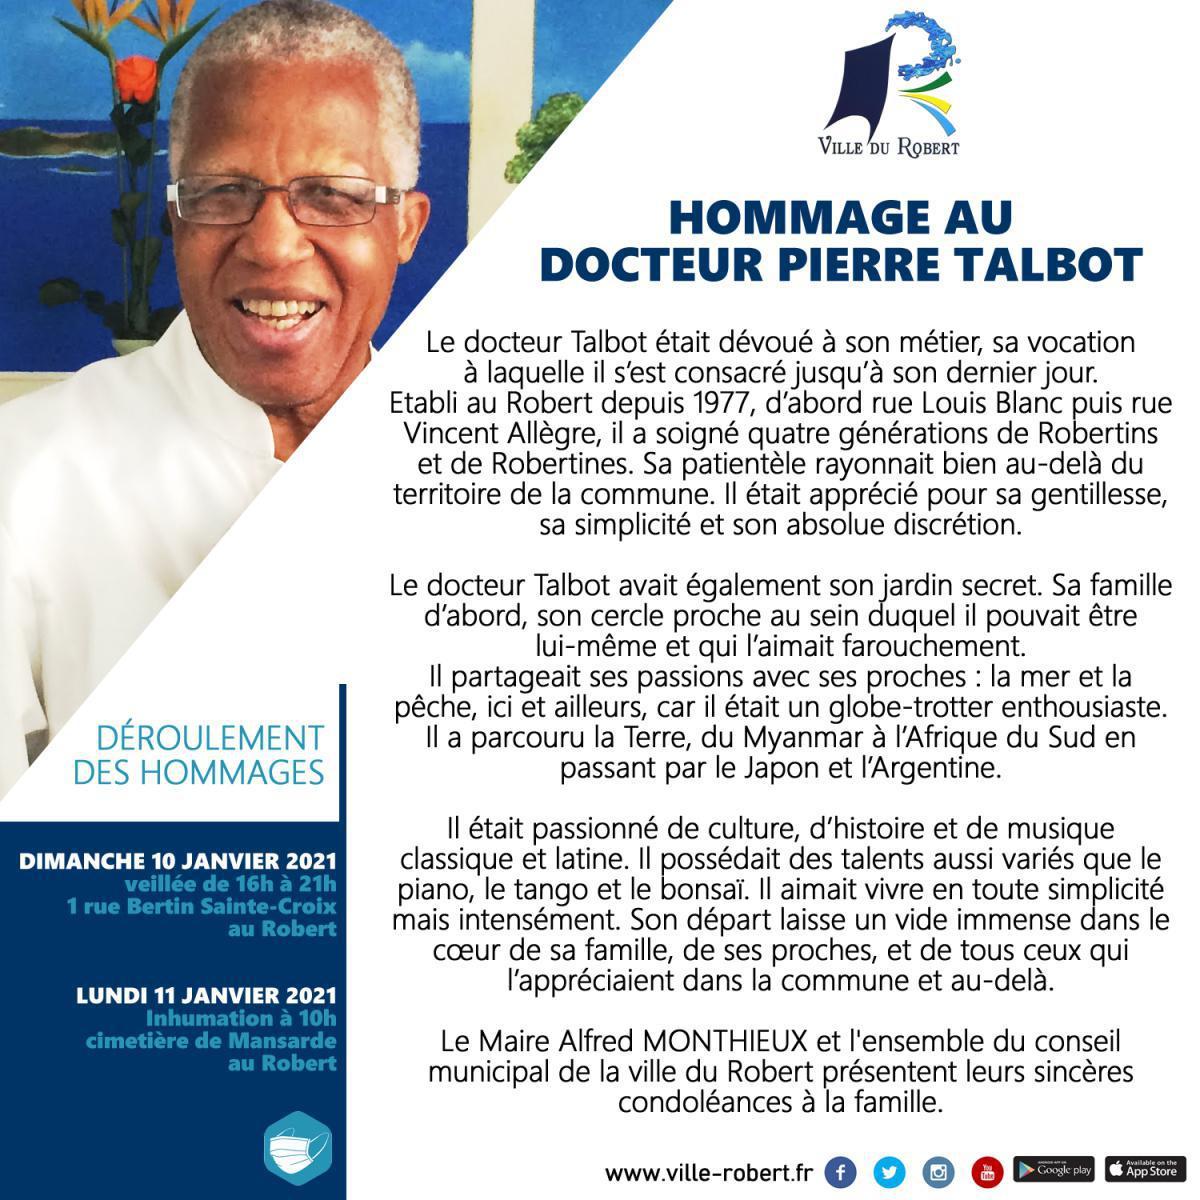 HOMMAGE AU DOCTEUR PIERRE TALBOT